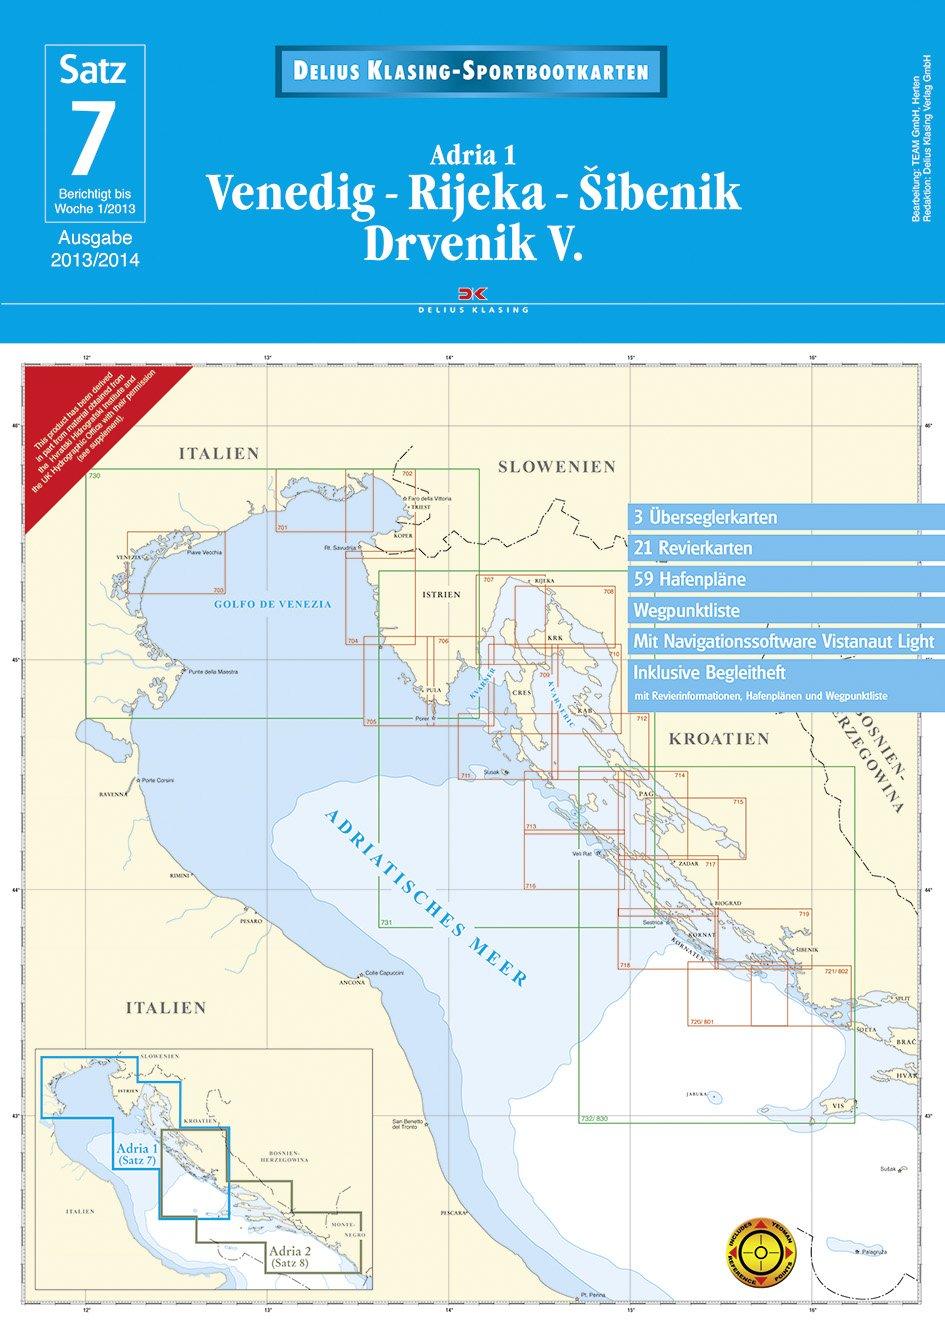 Satz 7: Venedig - Rijeka - Šibenik - Drvenik V. (2013/2014): Adria 1